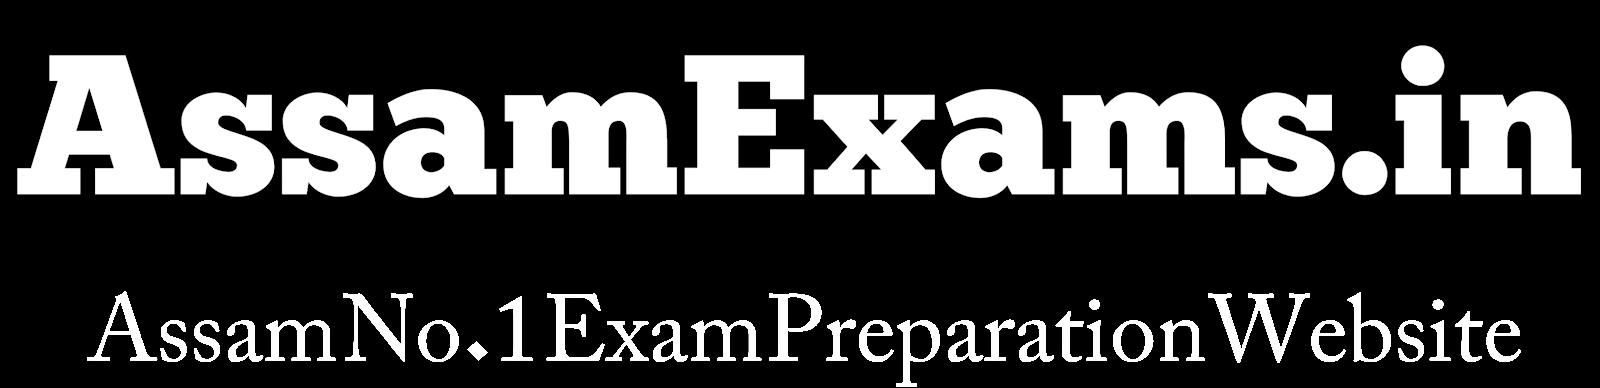 AssamExams.in :: Assam GK , Indian GK & Assam All Exams Preparation Website